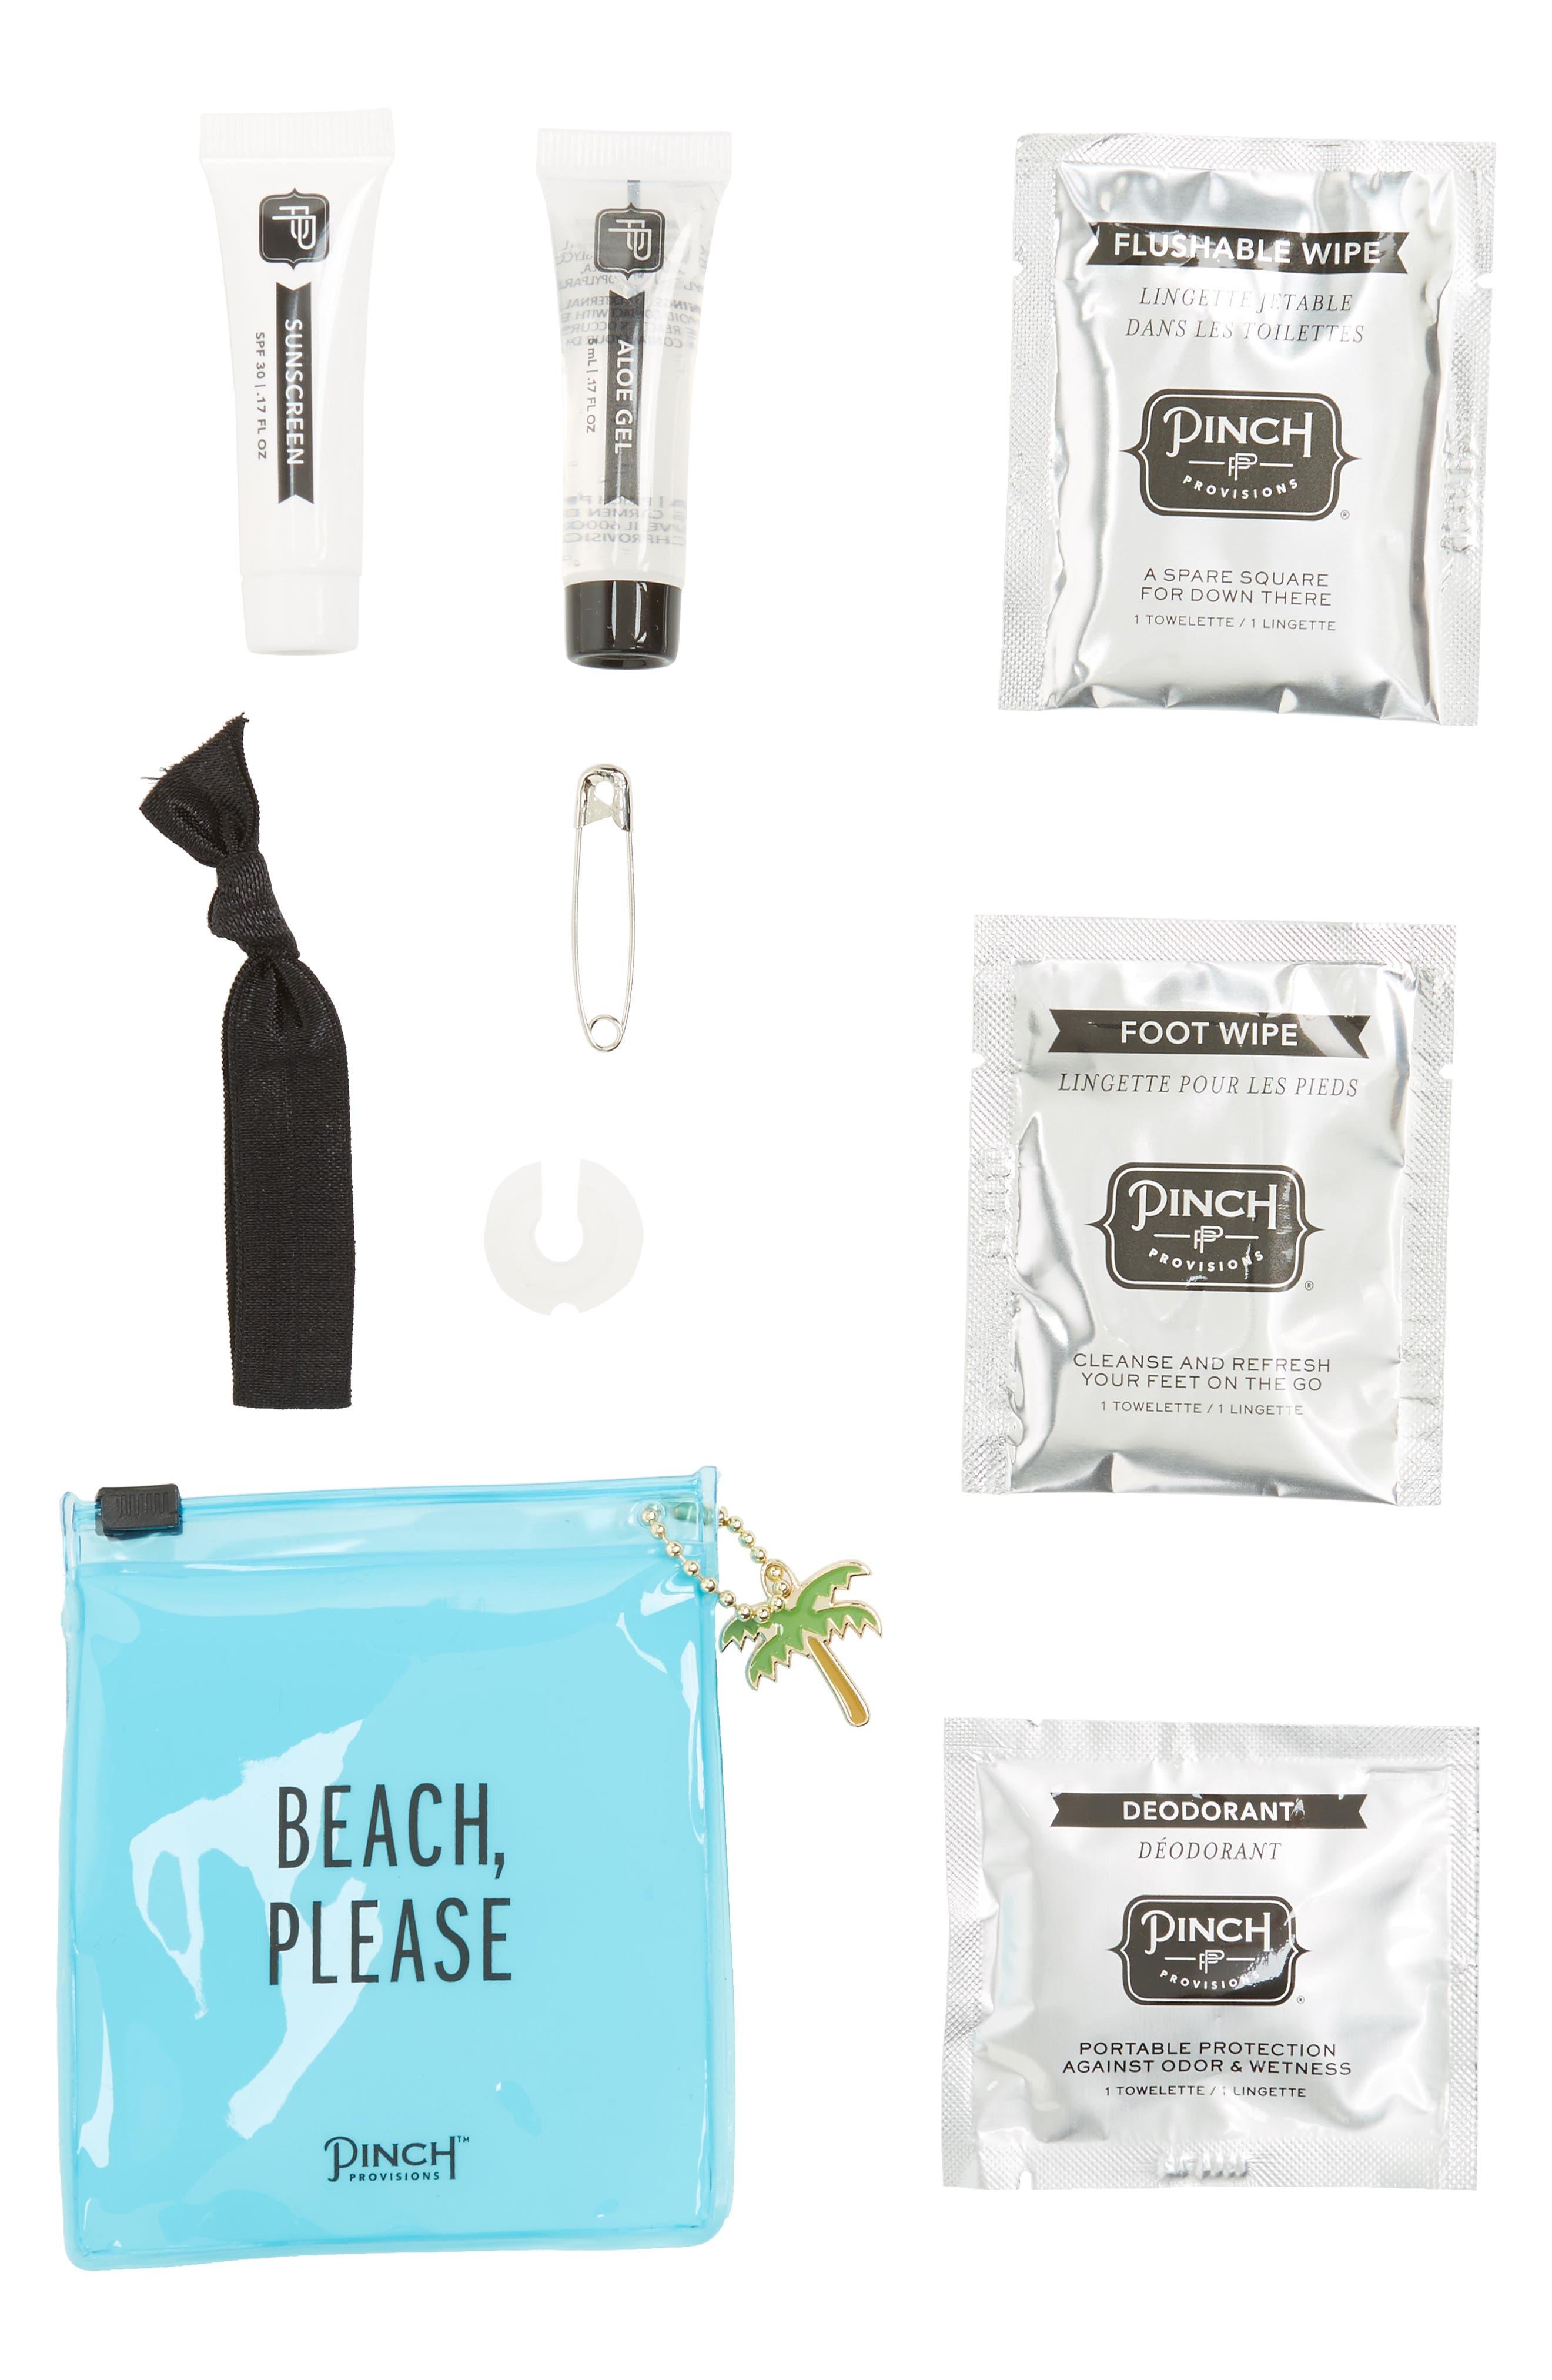 Pinch Provisions Beach Kit